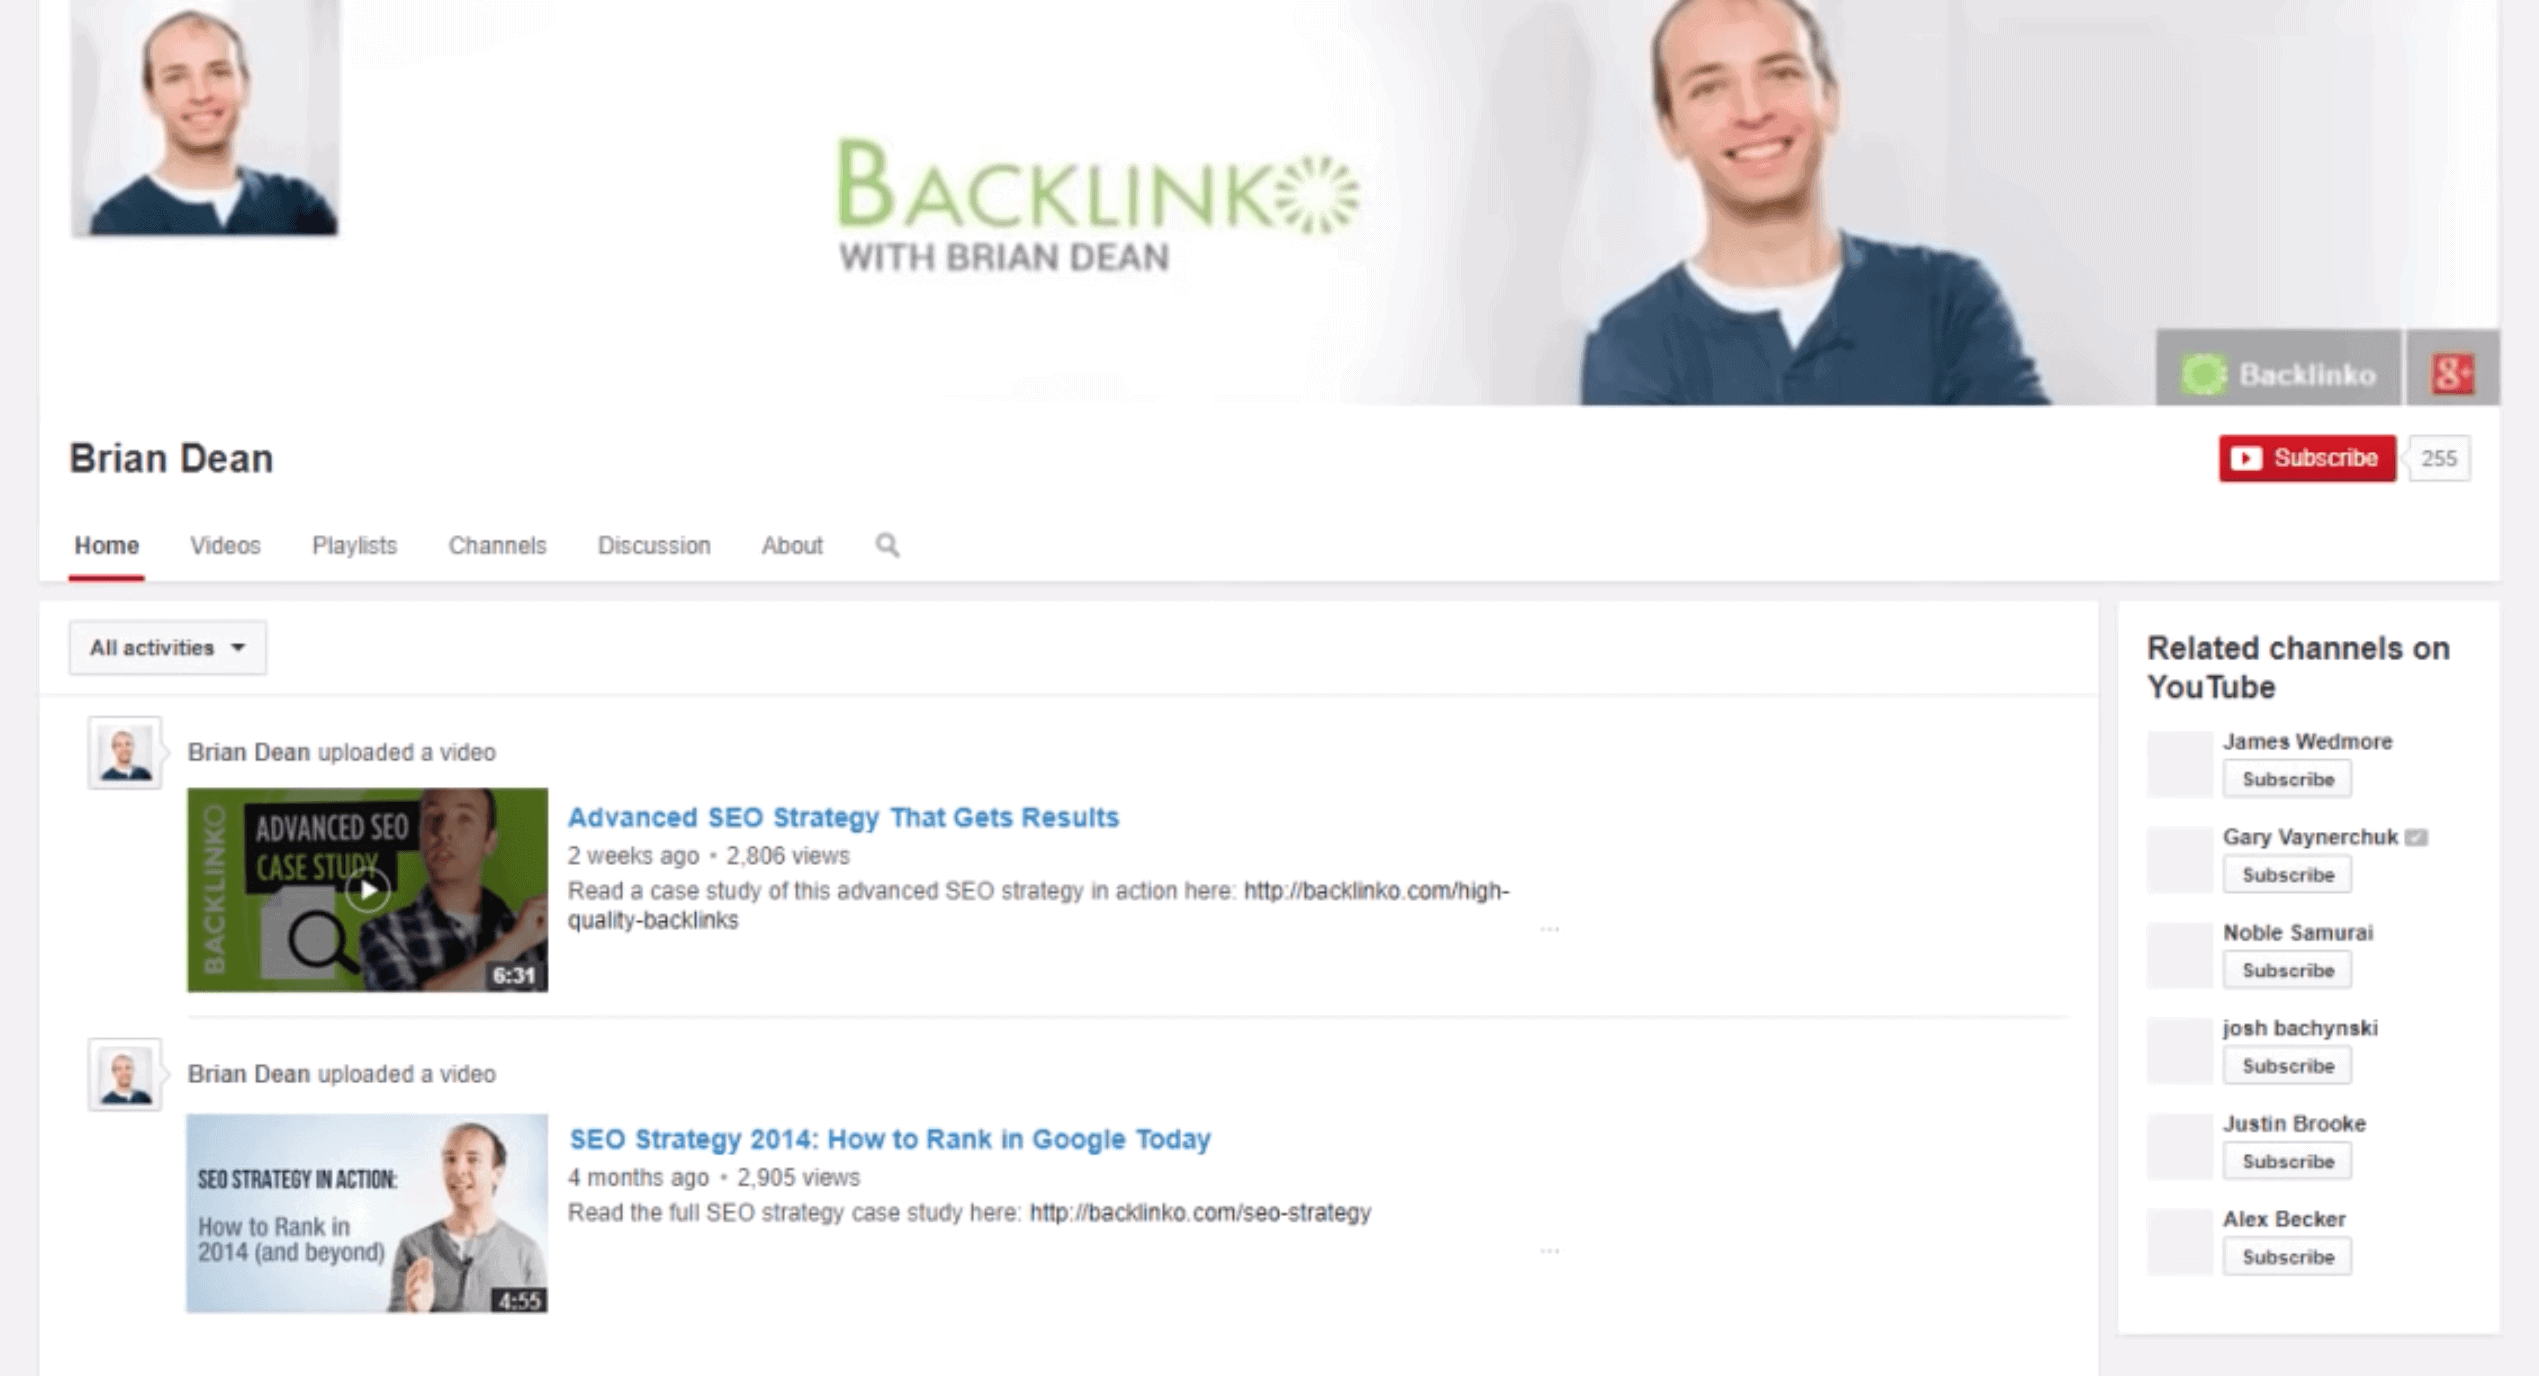 Old Backlinko YouTube channel – Unprofessional